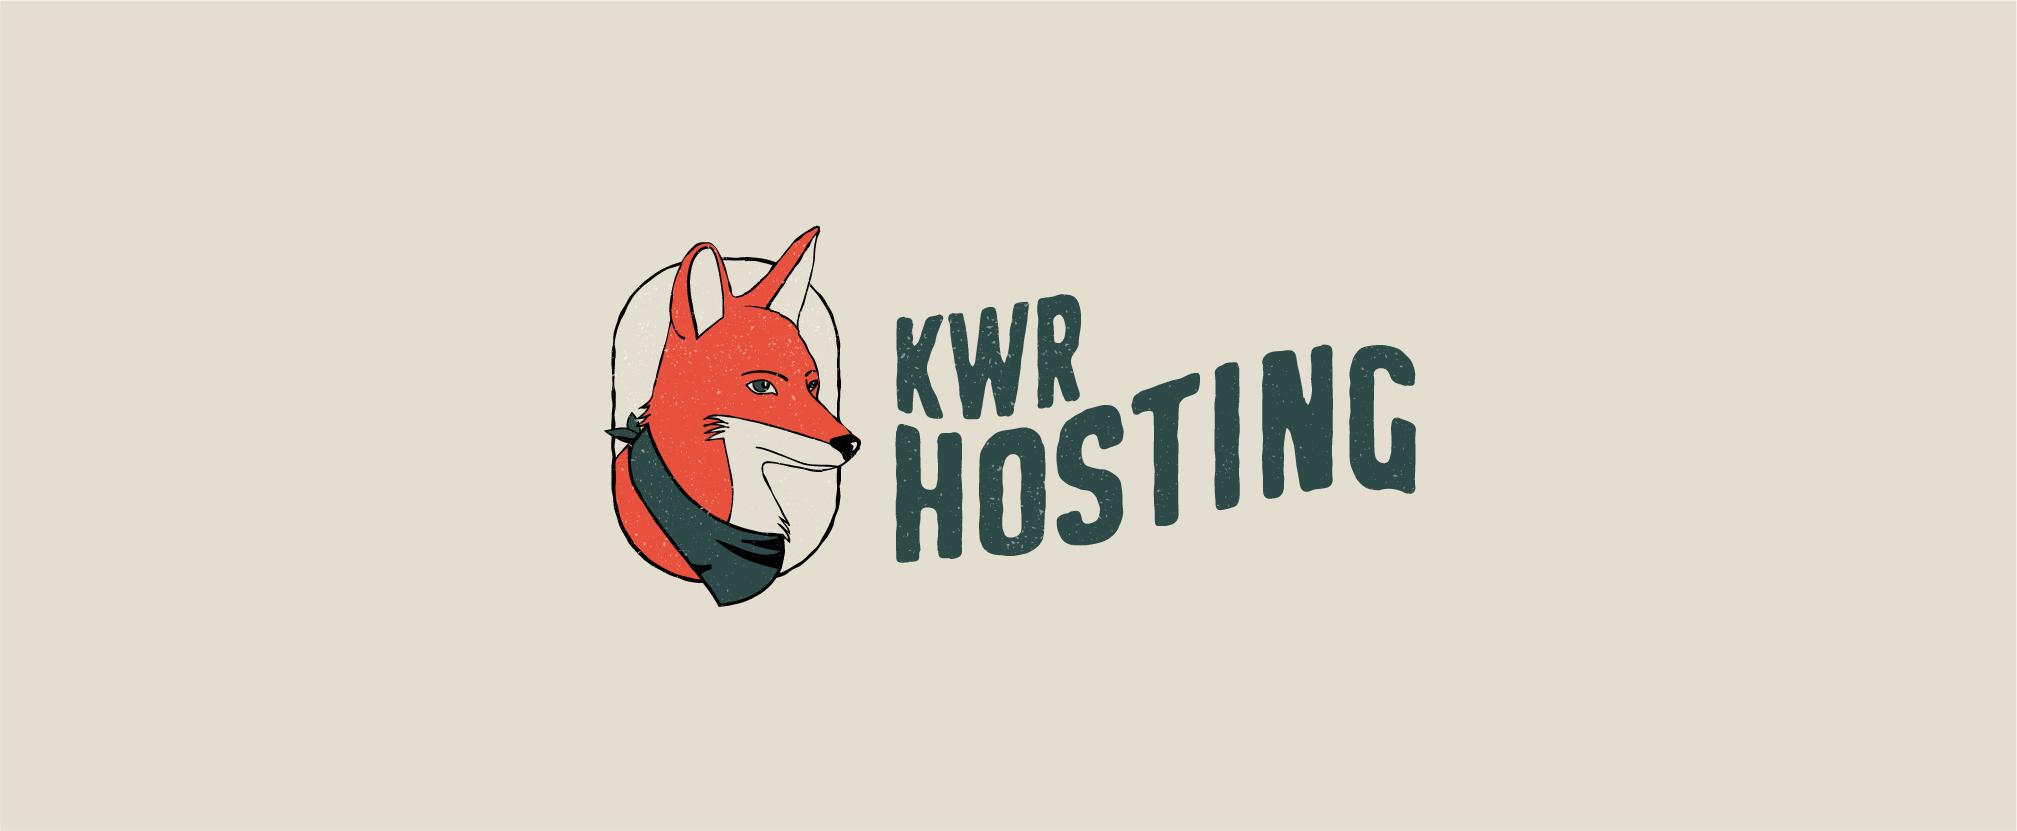 Keeping Websites Real Brand Identity primary logo fox custom illustration